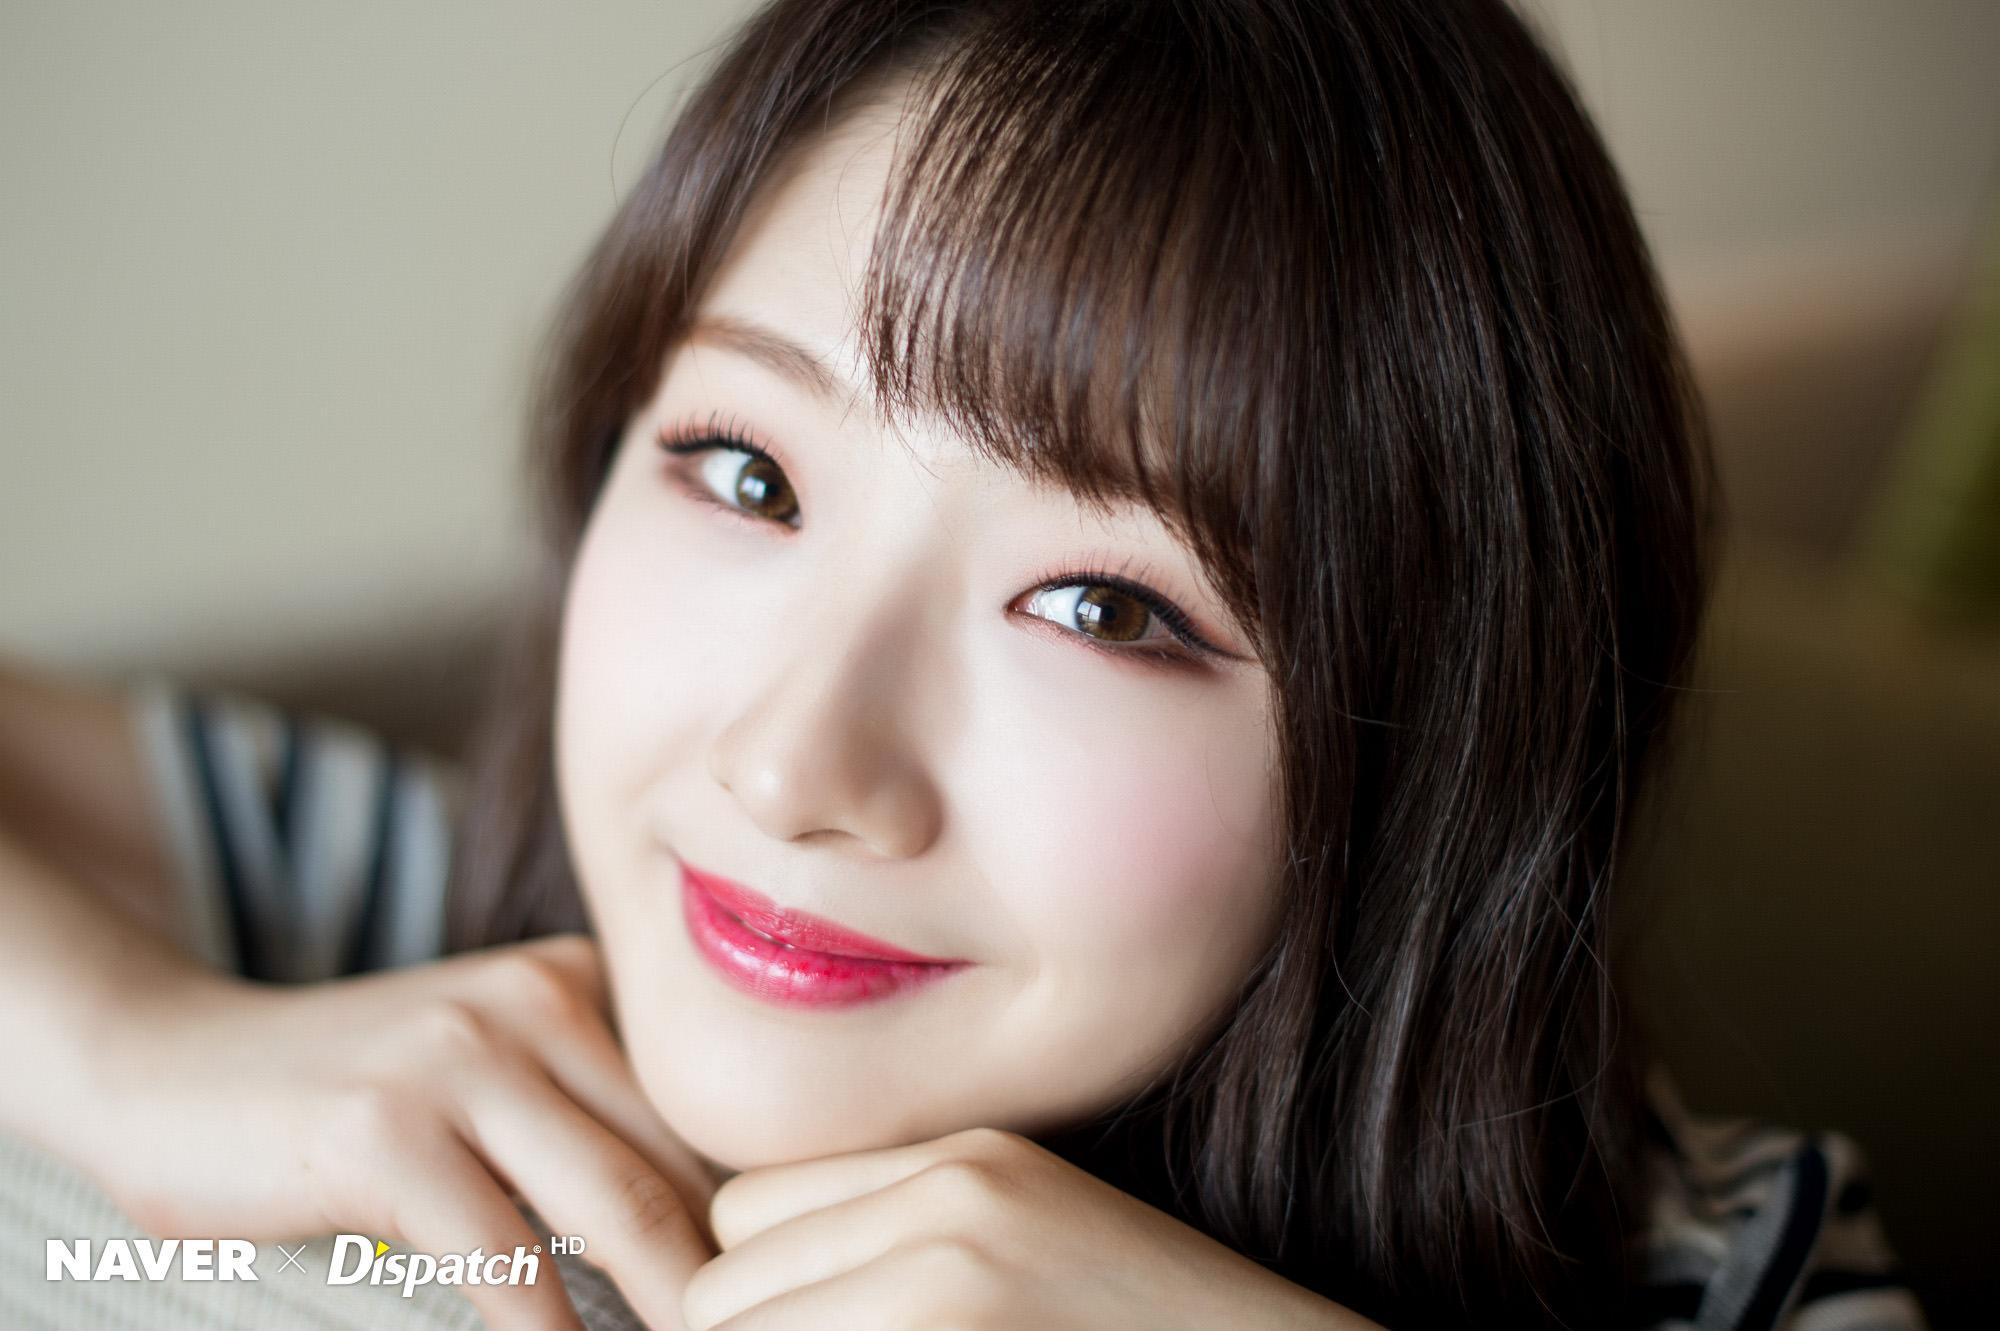 HaSeul NaverxDispatch August 2018 5.jpg